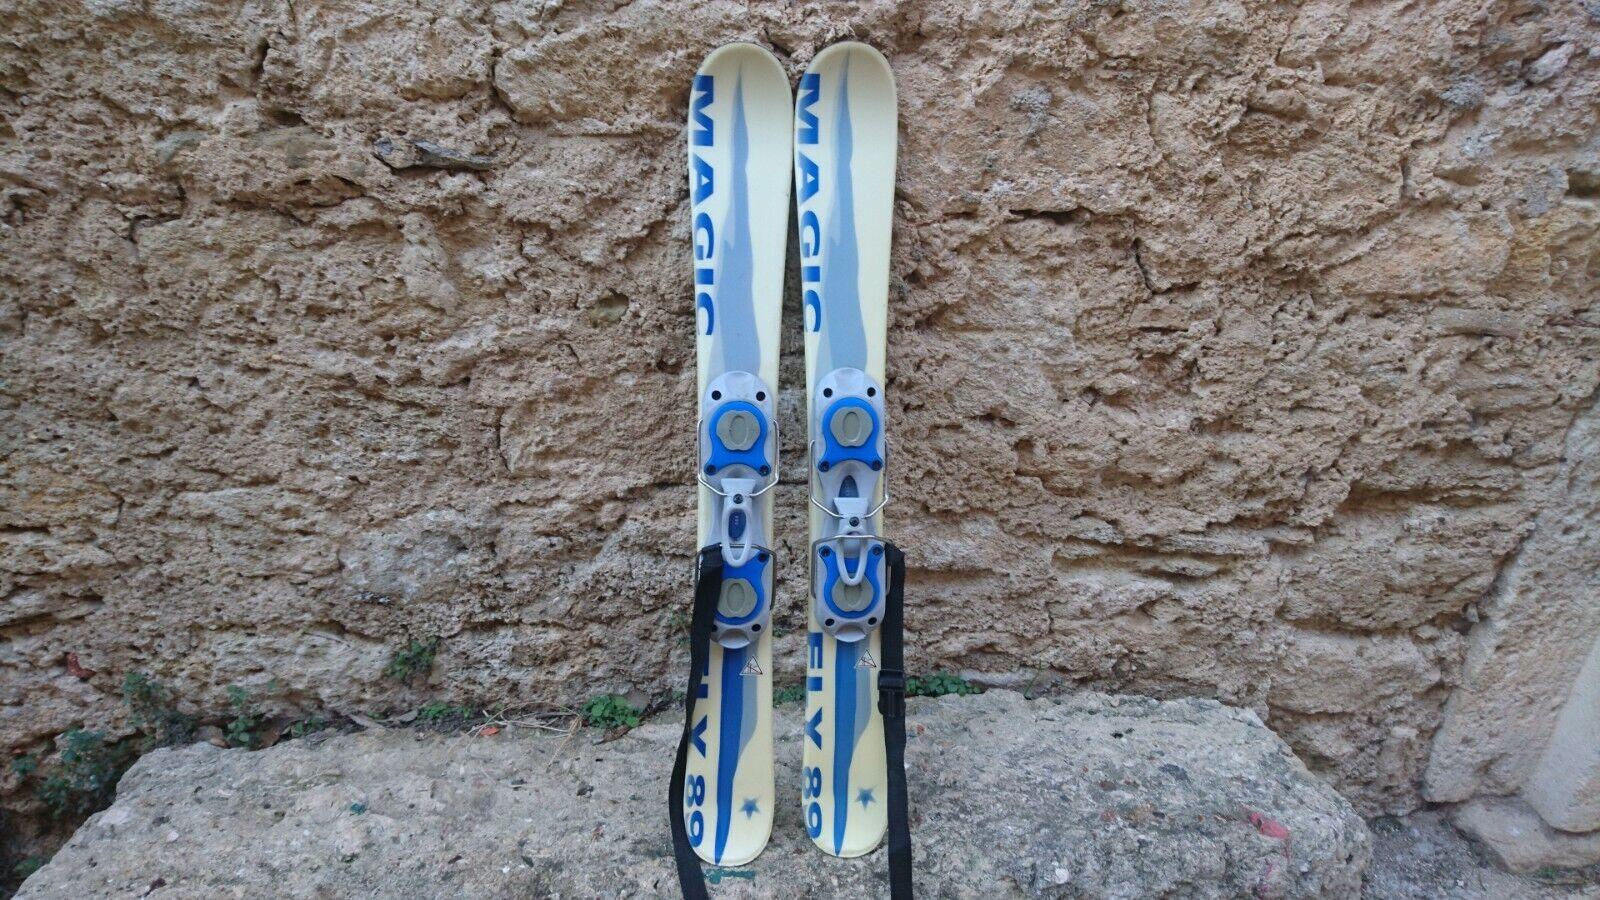 SNOWBLADE SALOMON 89cm PATINETTES MINISKIS MINI SKIS